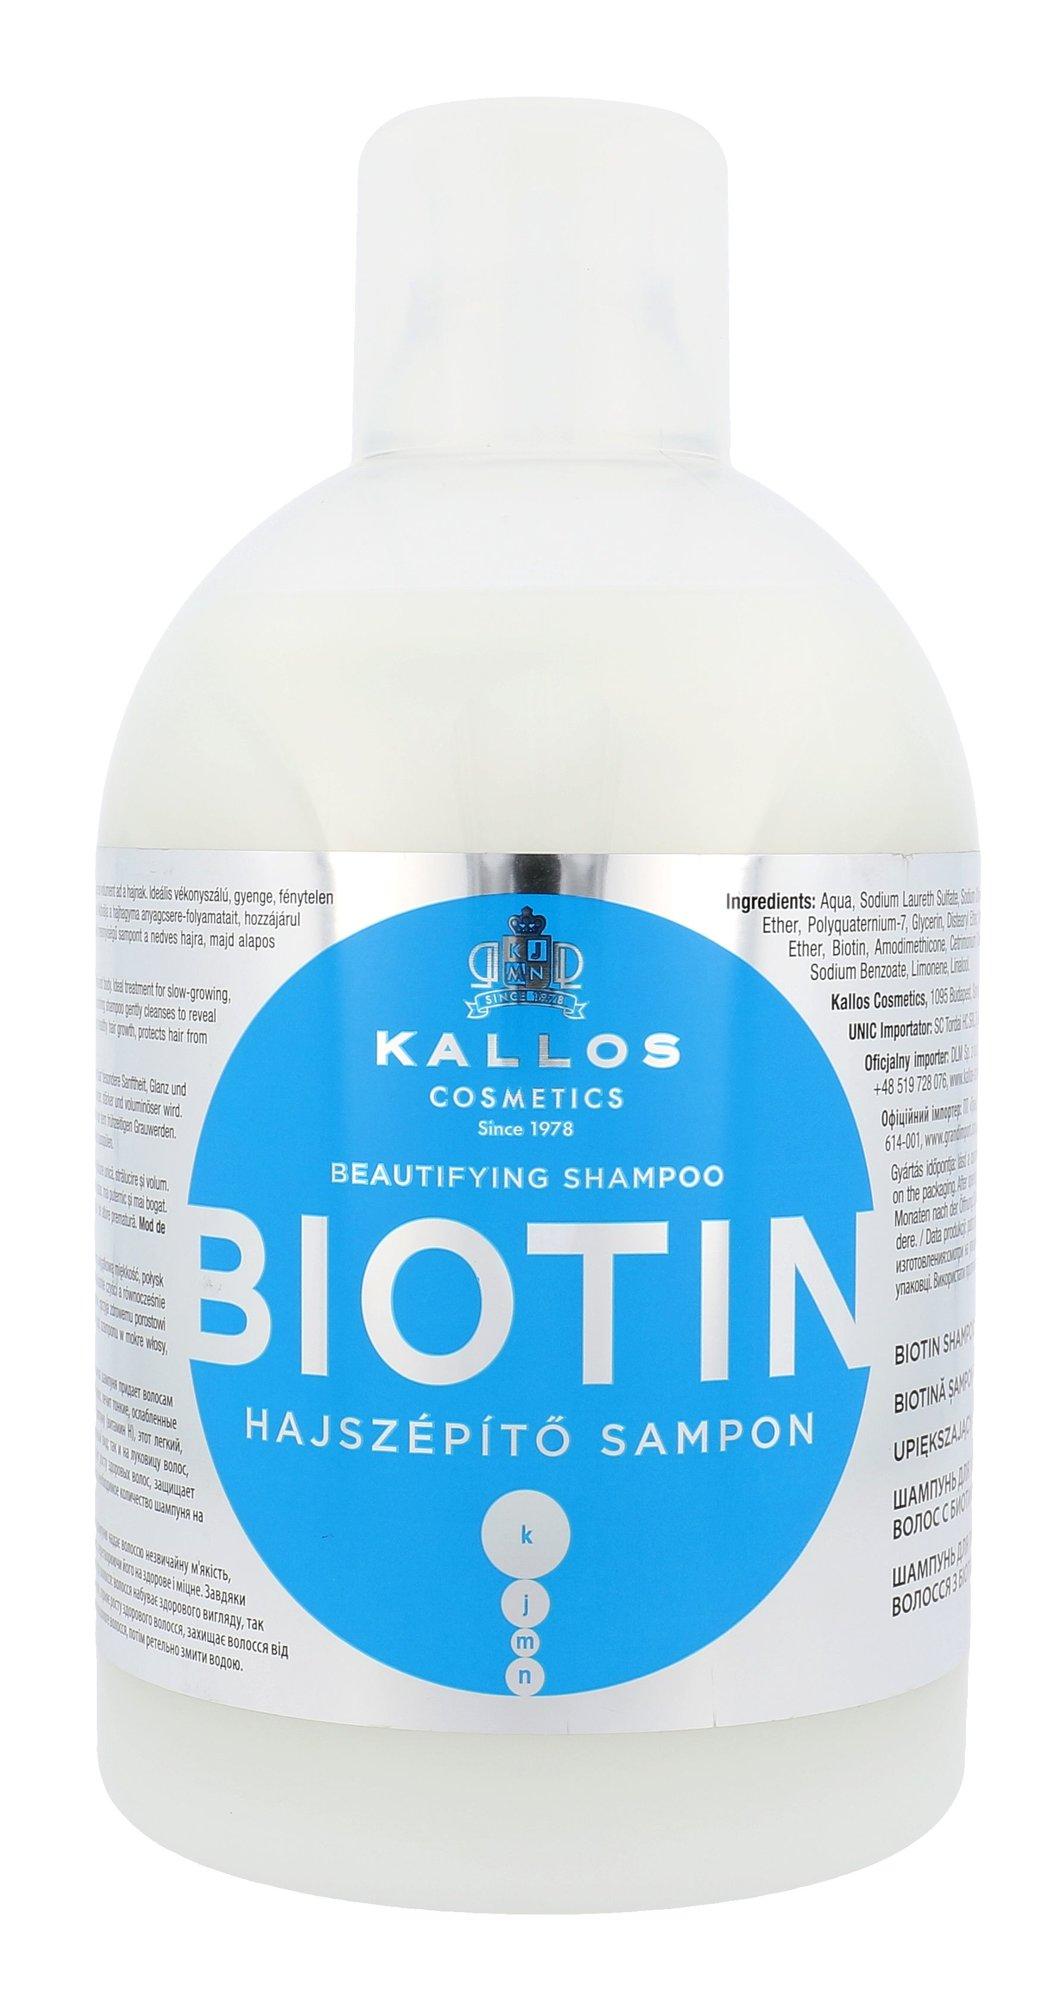 Kallos Biotin Shampoo Cosmetic 1000ml